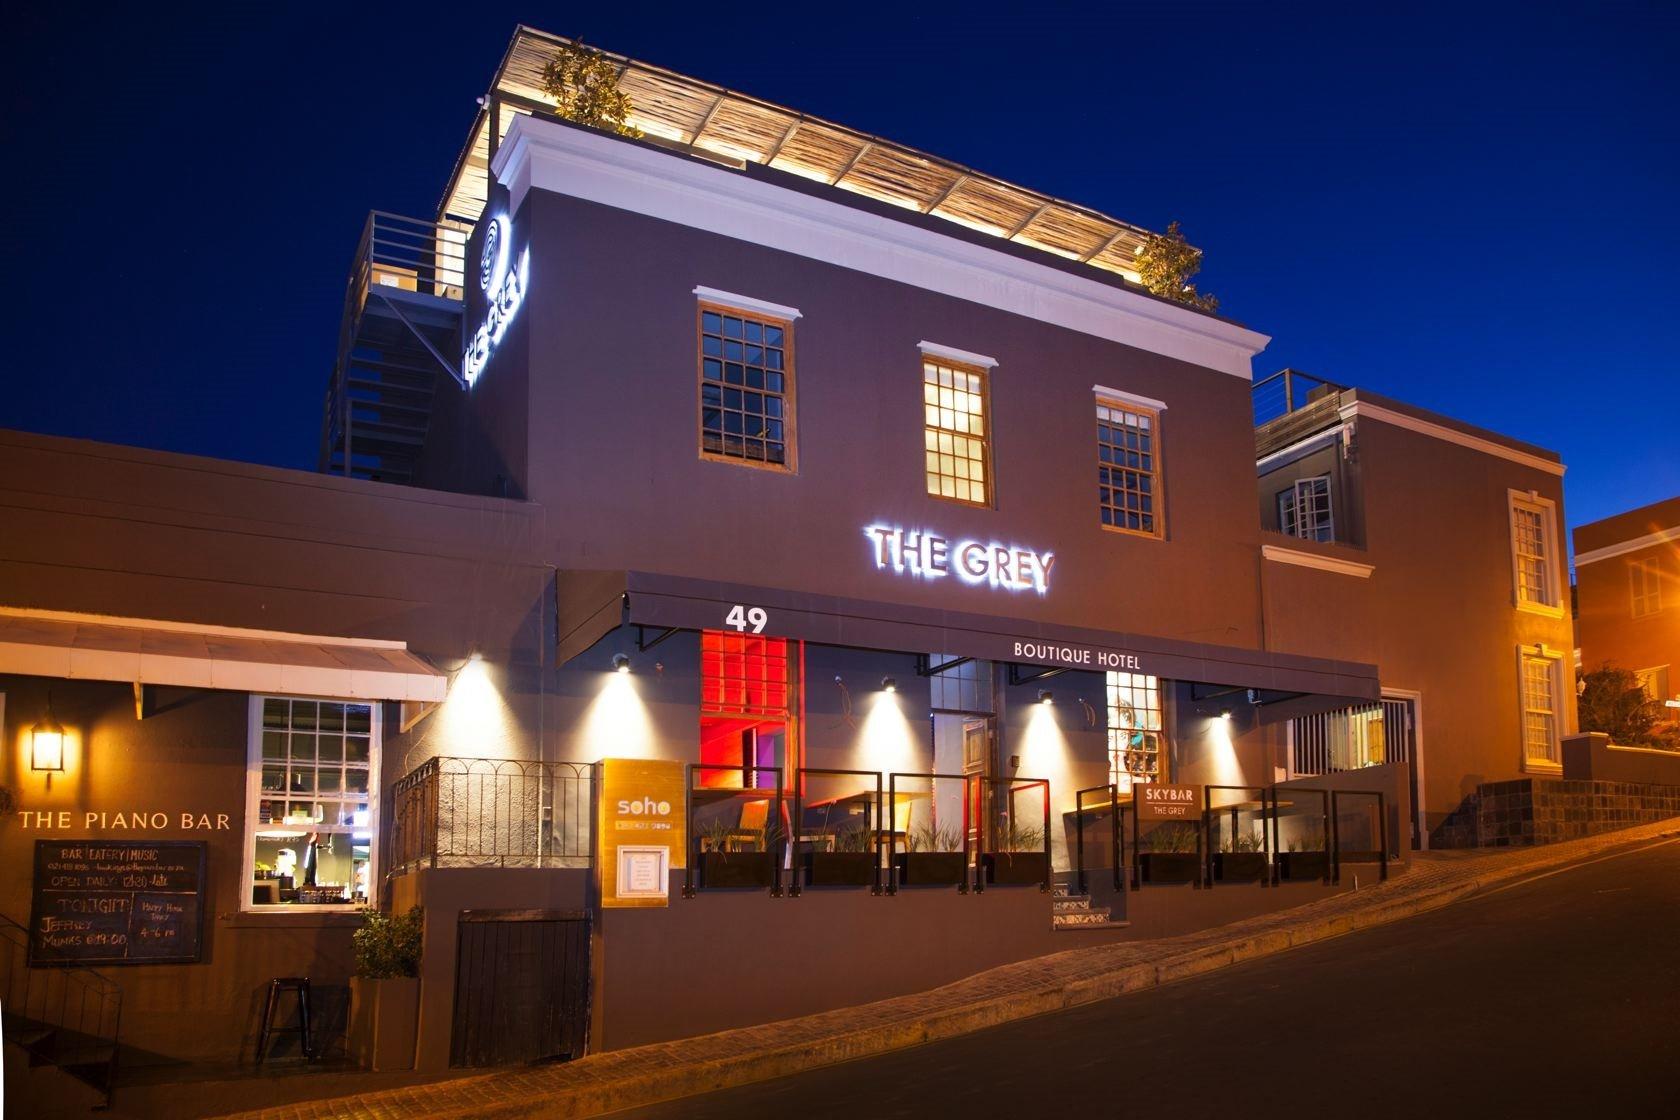 The Grey Hotel